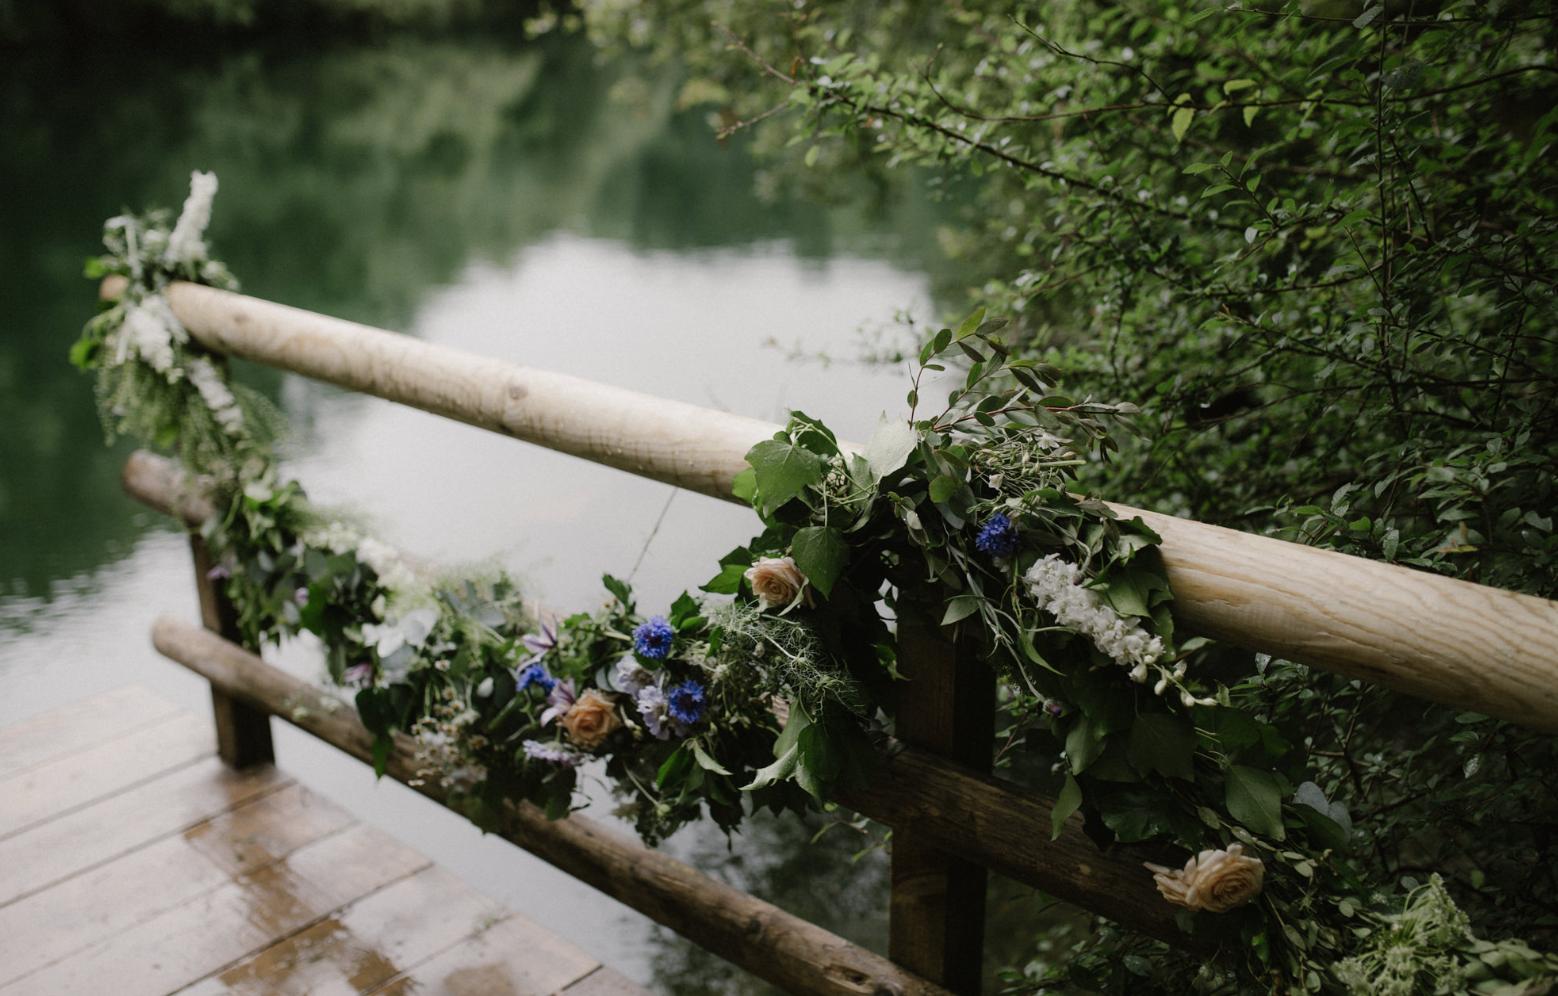 RiverAndFernPhotography